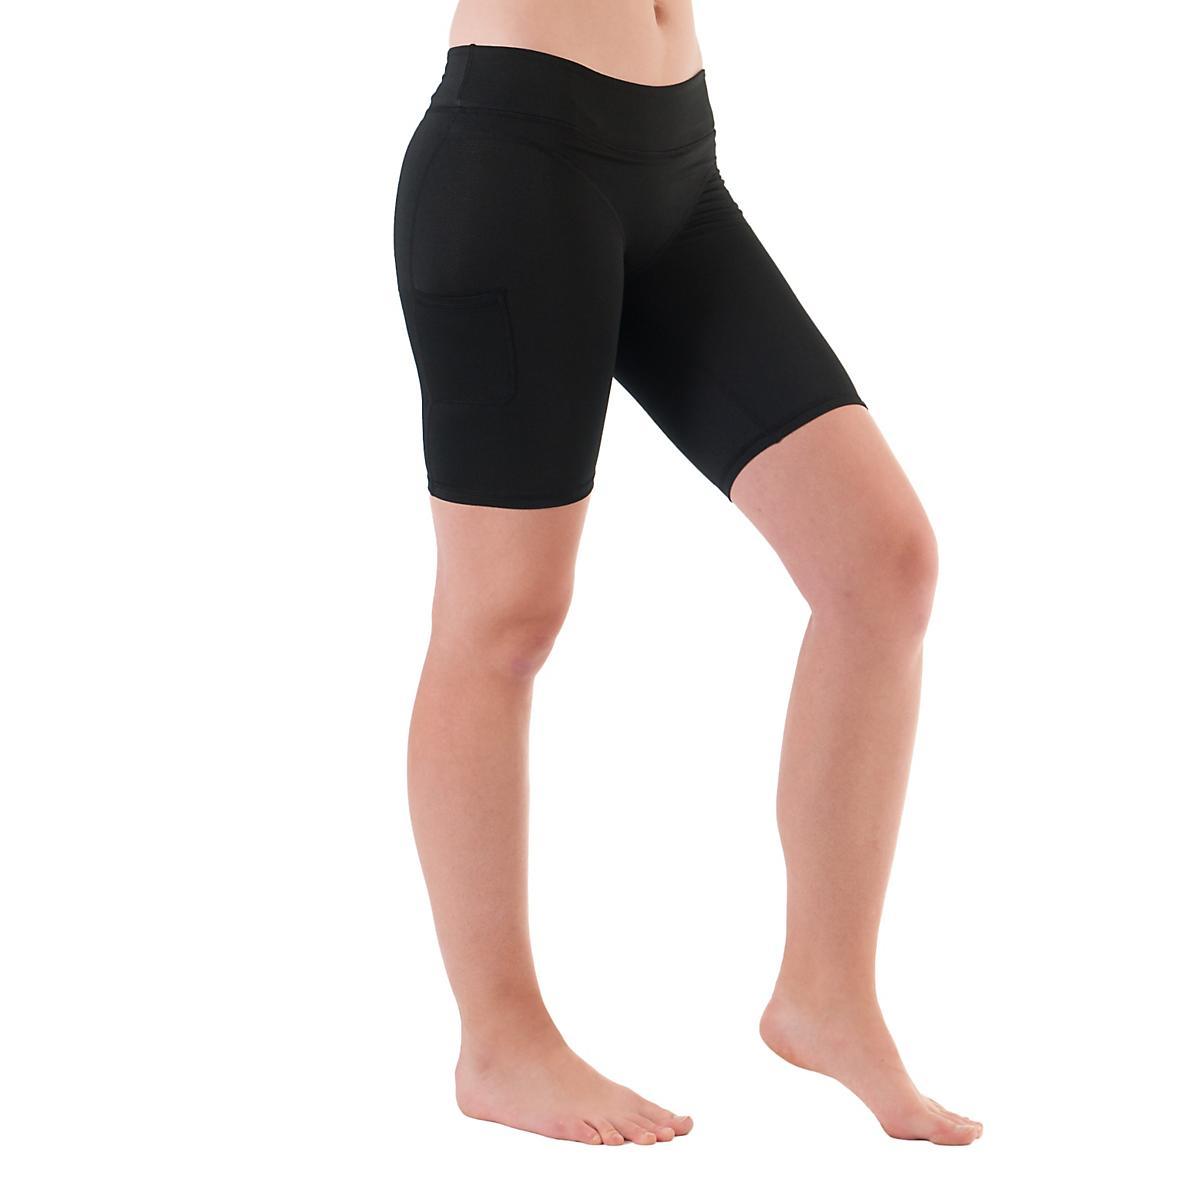 Women's Skirt Sports�Shorties 8 inch